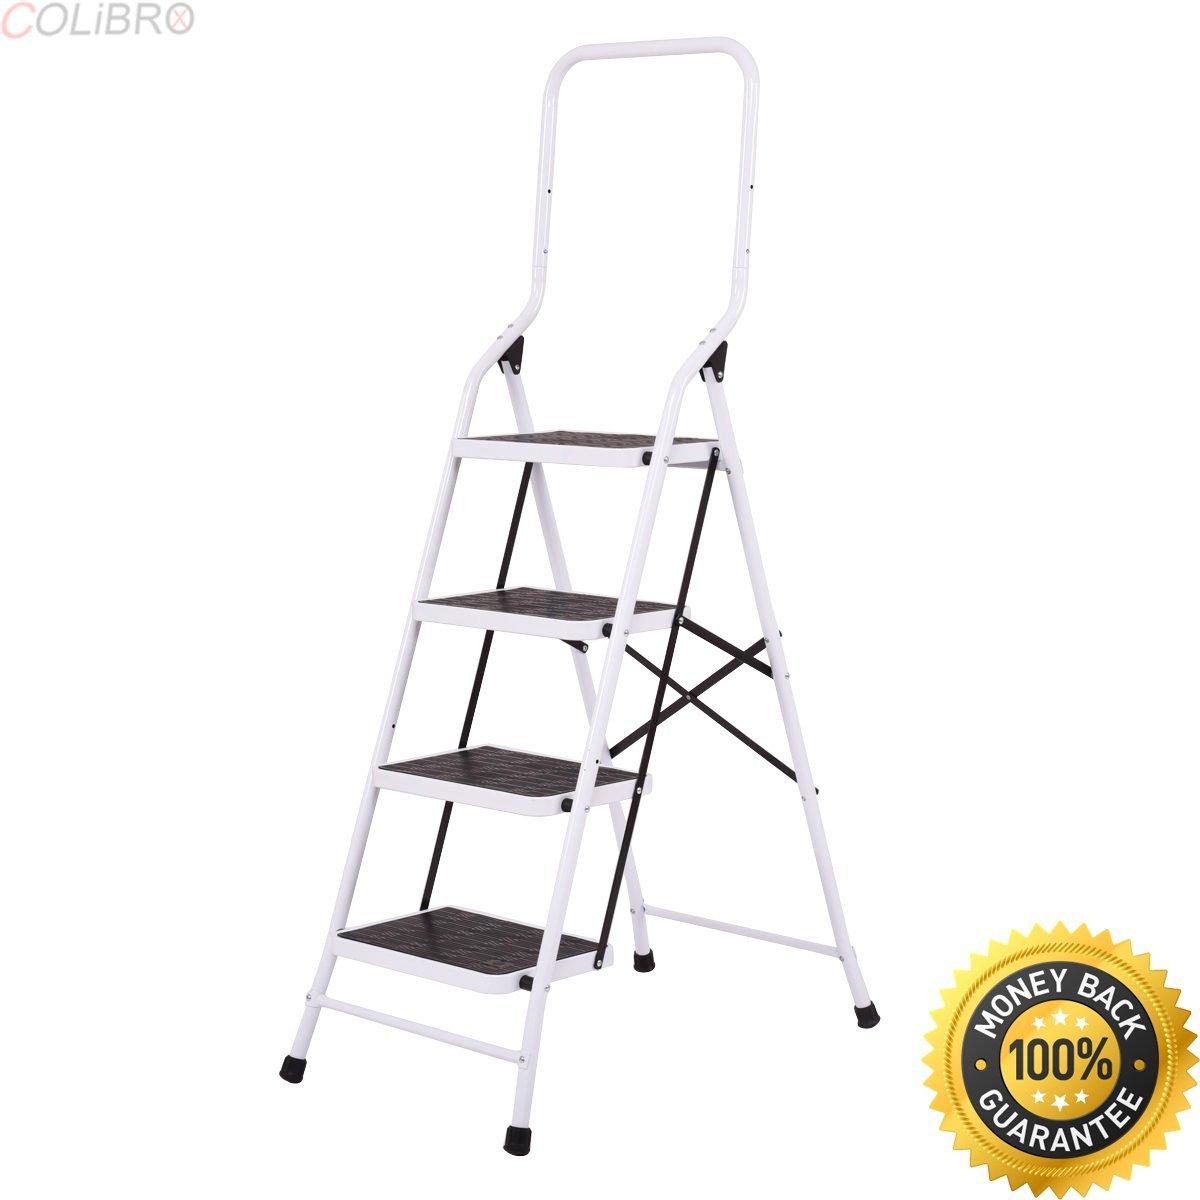 Tremendous Cheap Aluminum Step Stool Platform Find Aluminum Step Stool Creativecarmelina Interior Chair Design Creativecarmelinacom